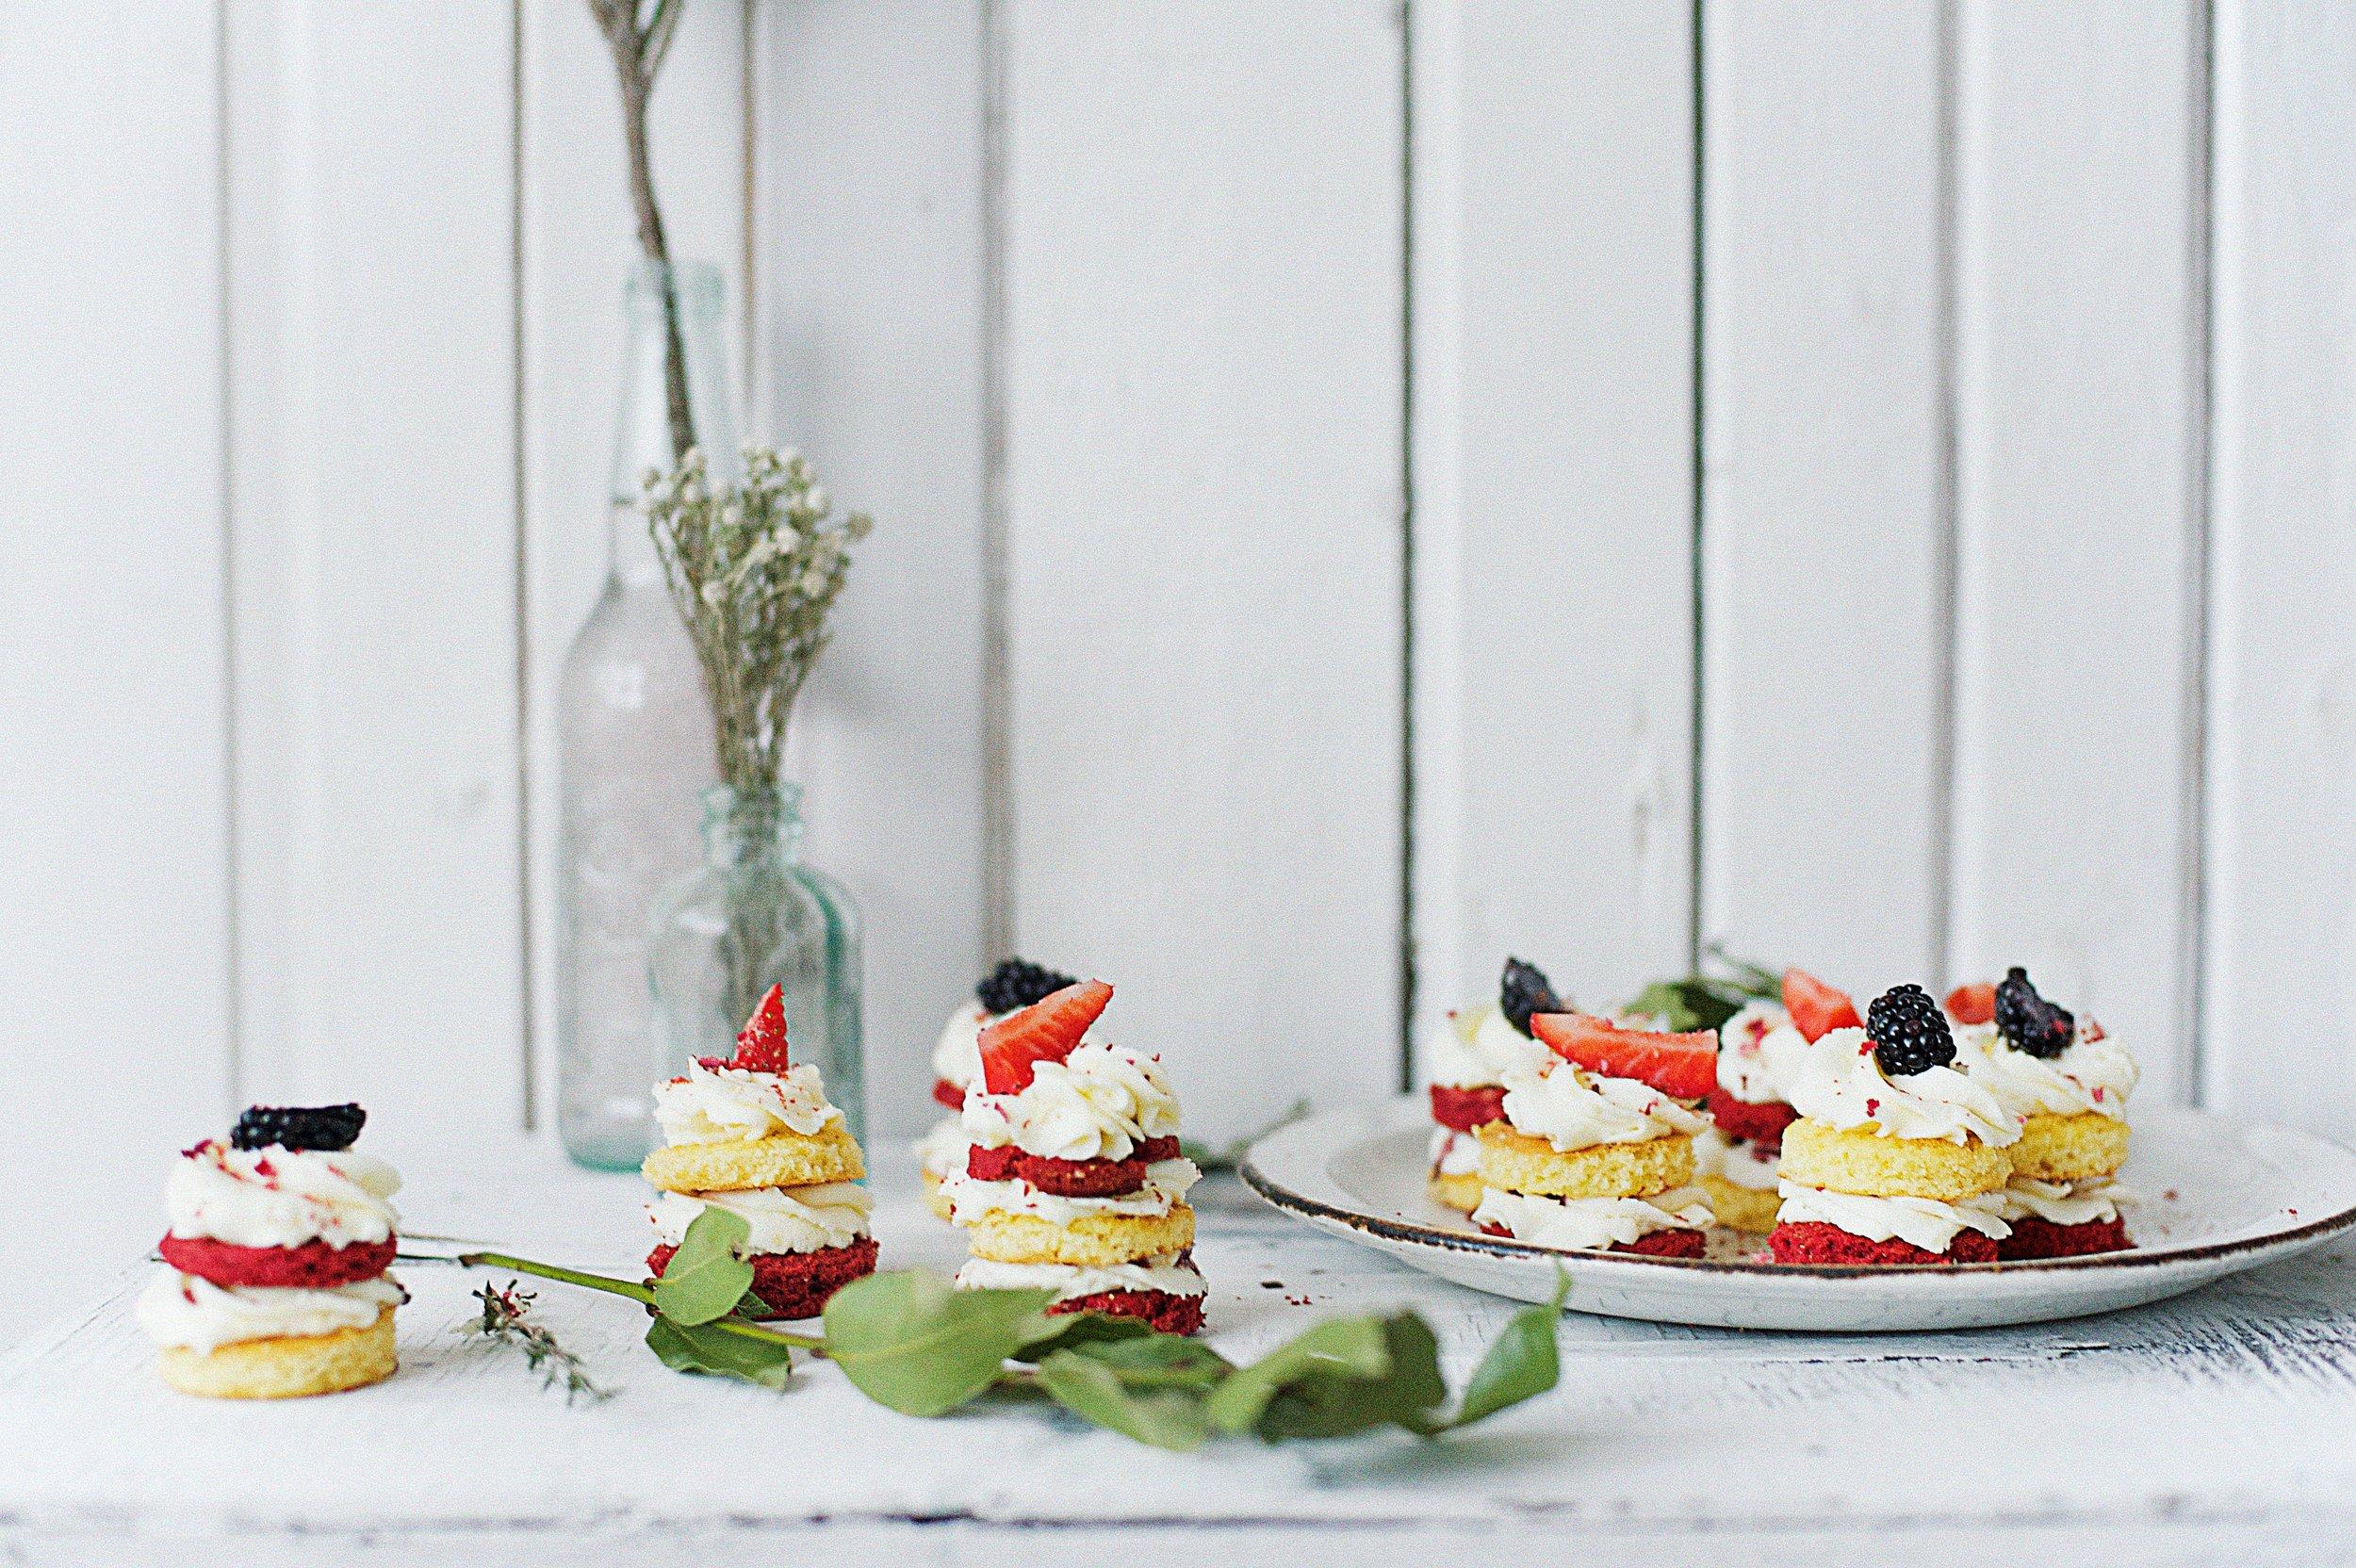 cake-celebration-cream-1070895.jpg